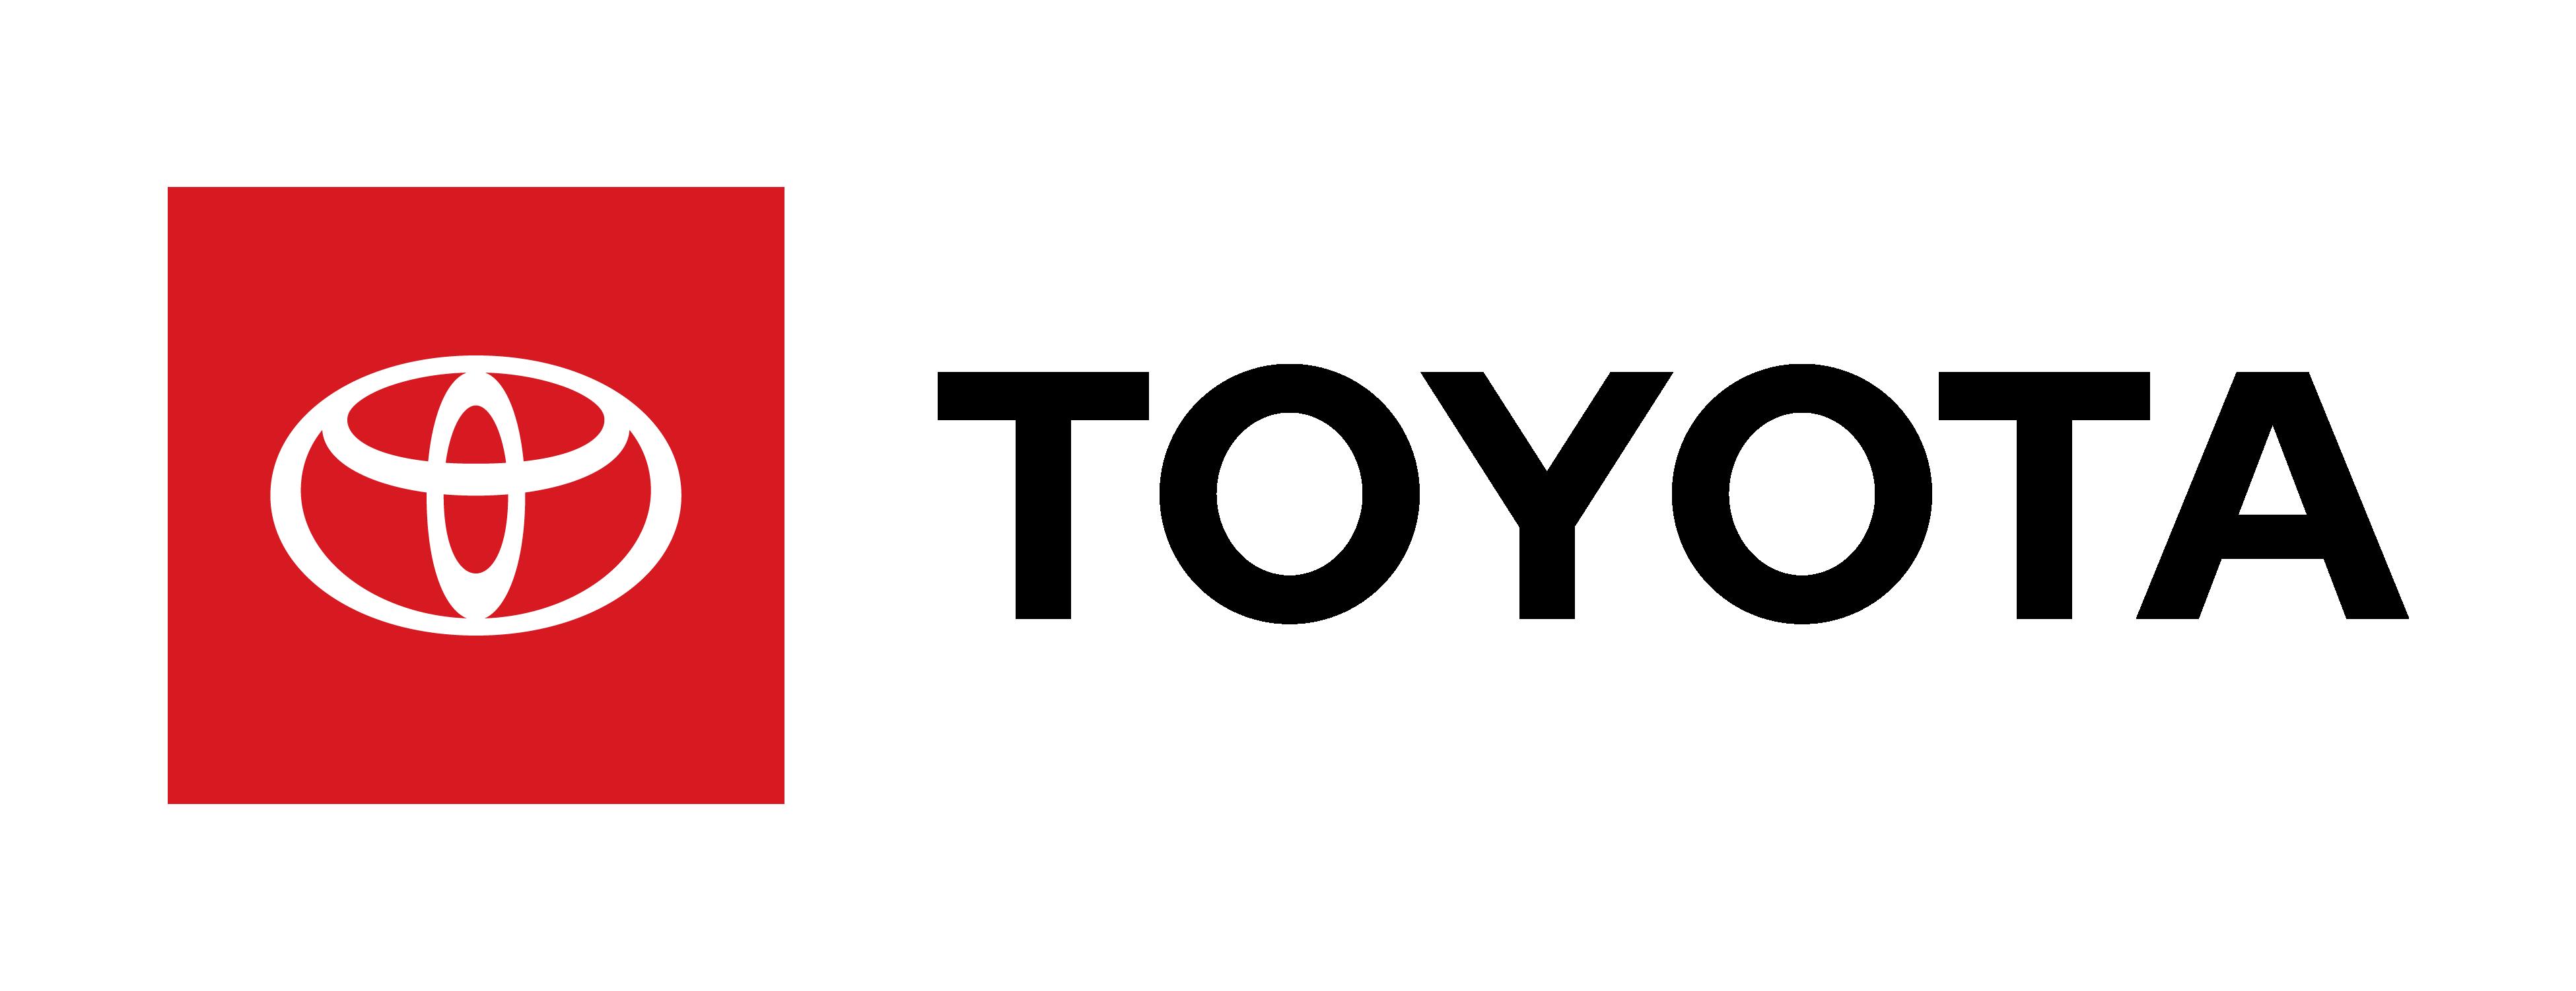 Toyota_rgb_horz_red&bk;-01.png